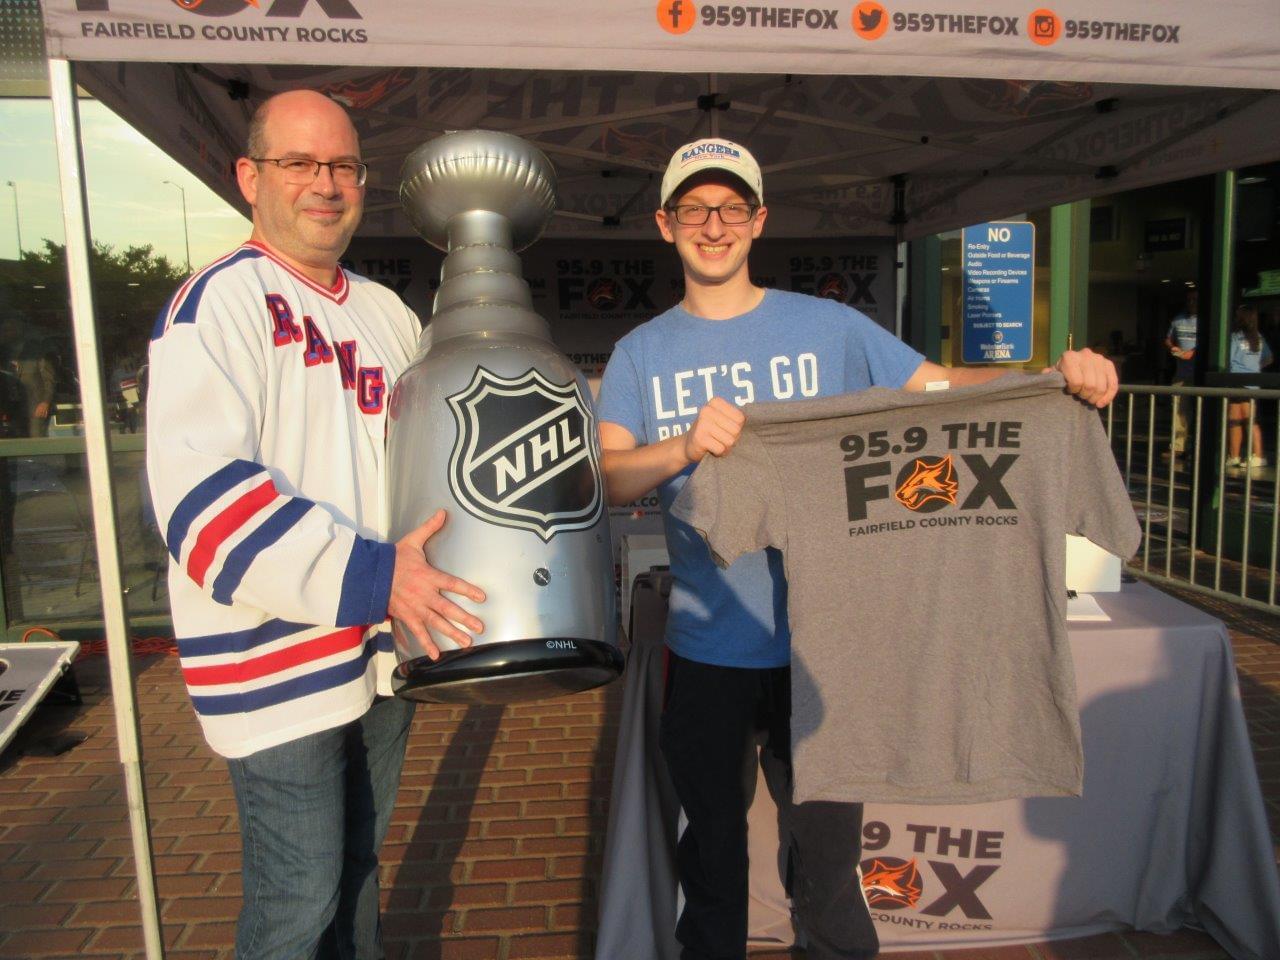 Rangers vs Islanders at Webster Bank Arena 9/28/19